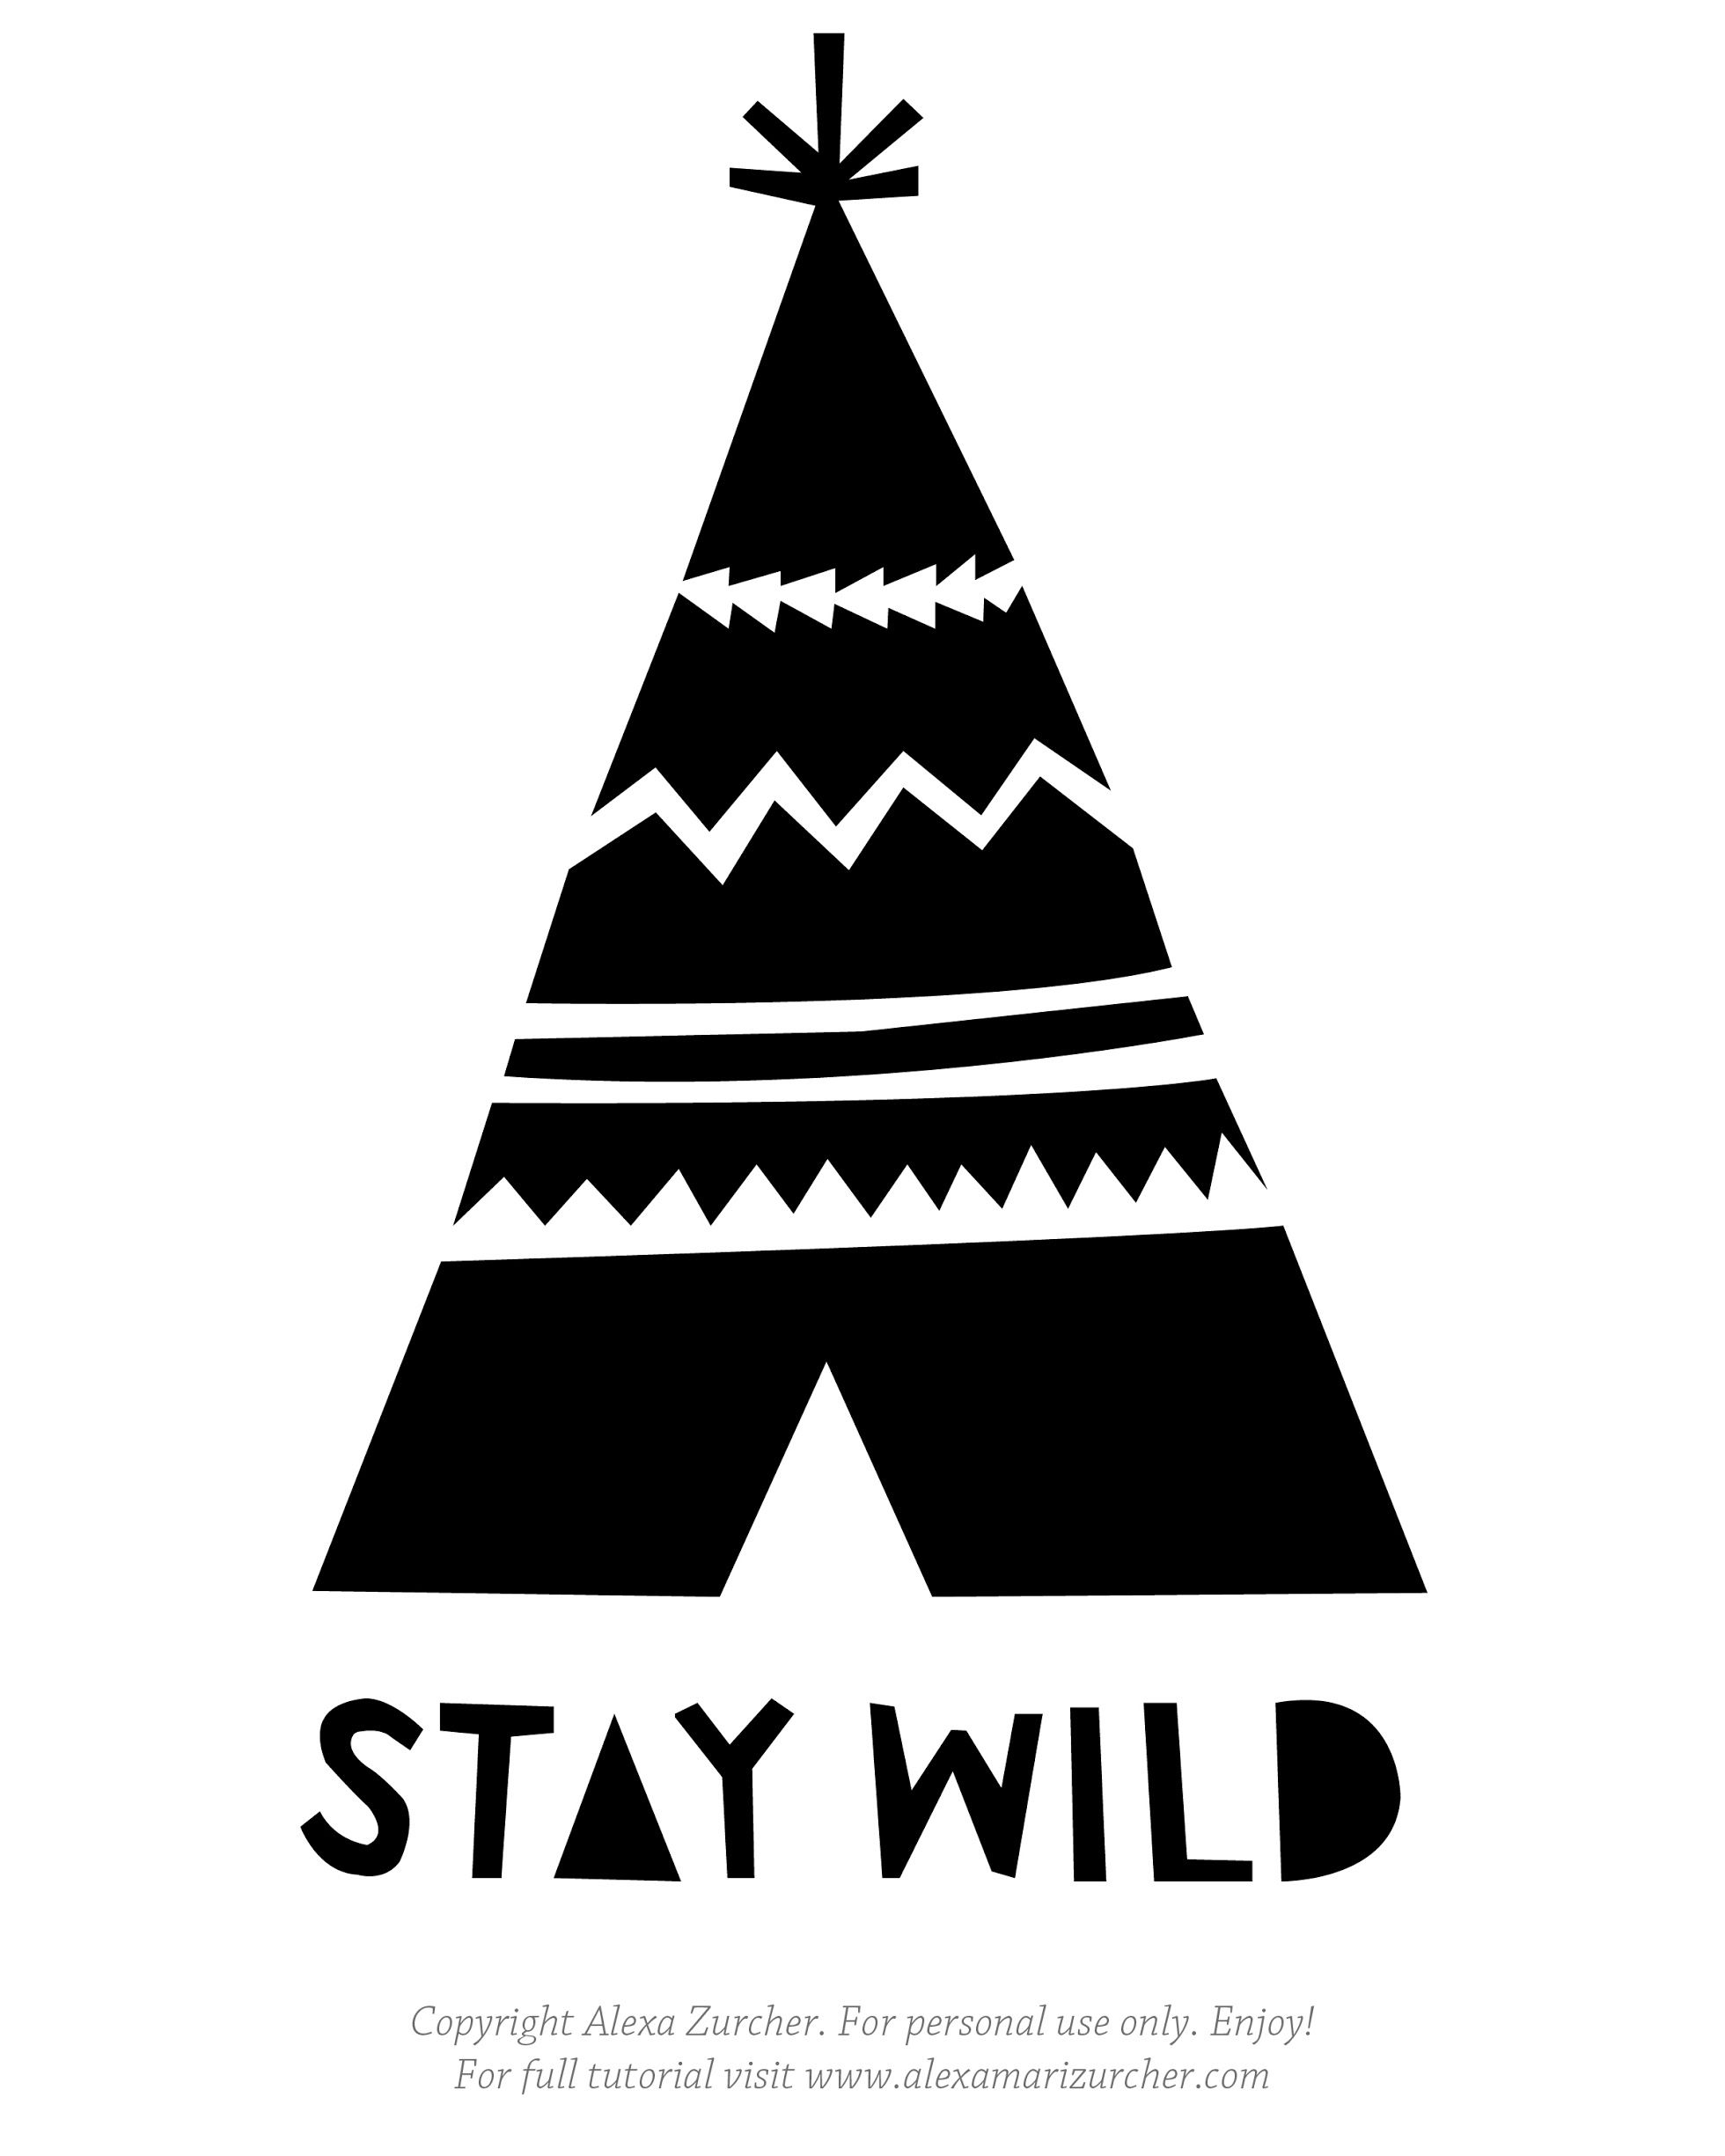 Displaying Stay Wild Stencil